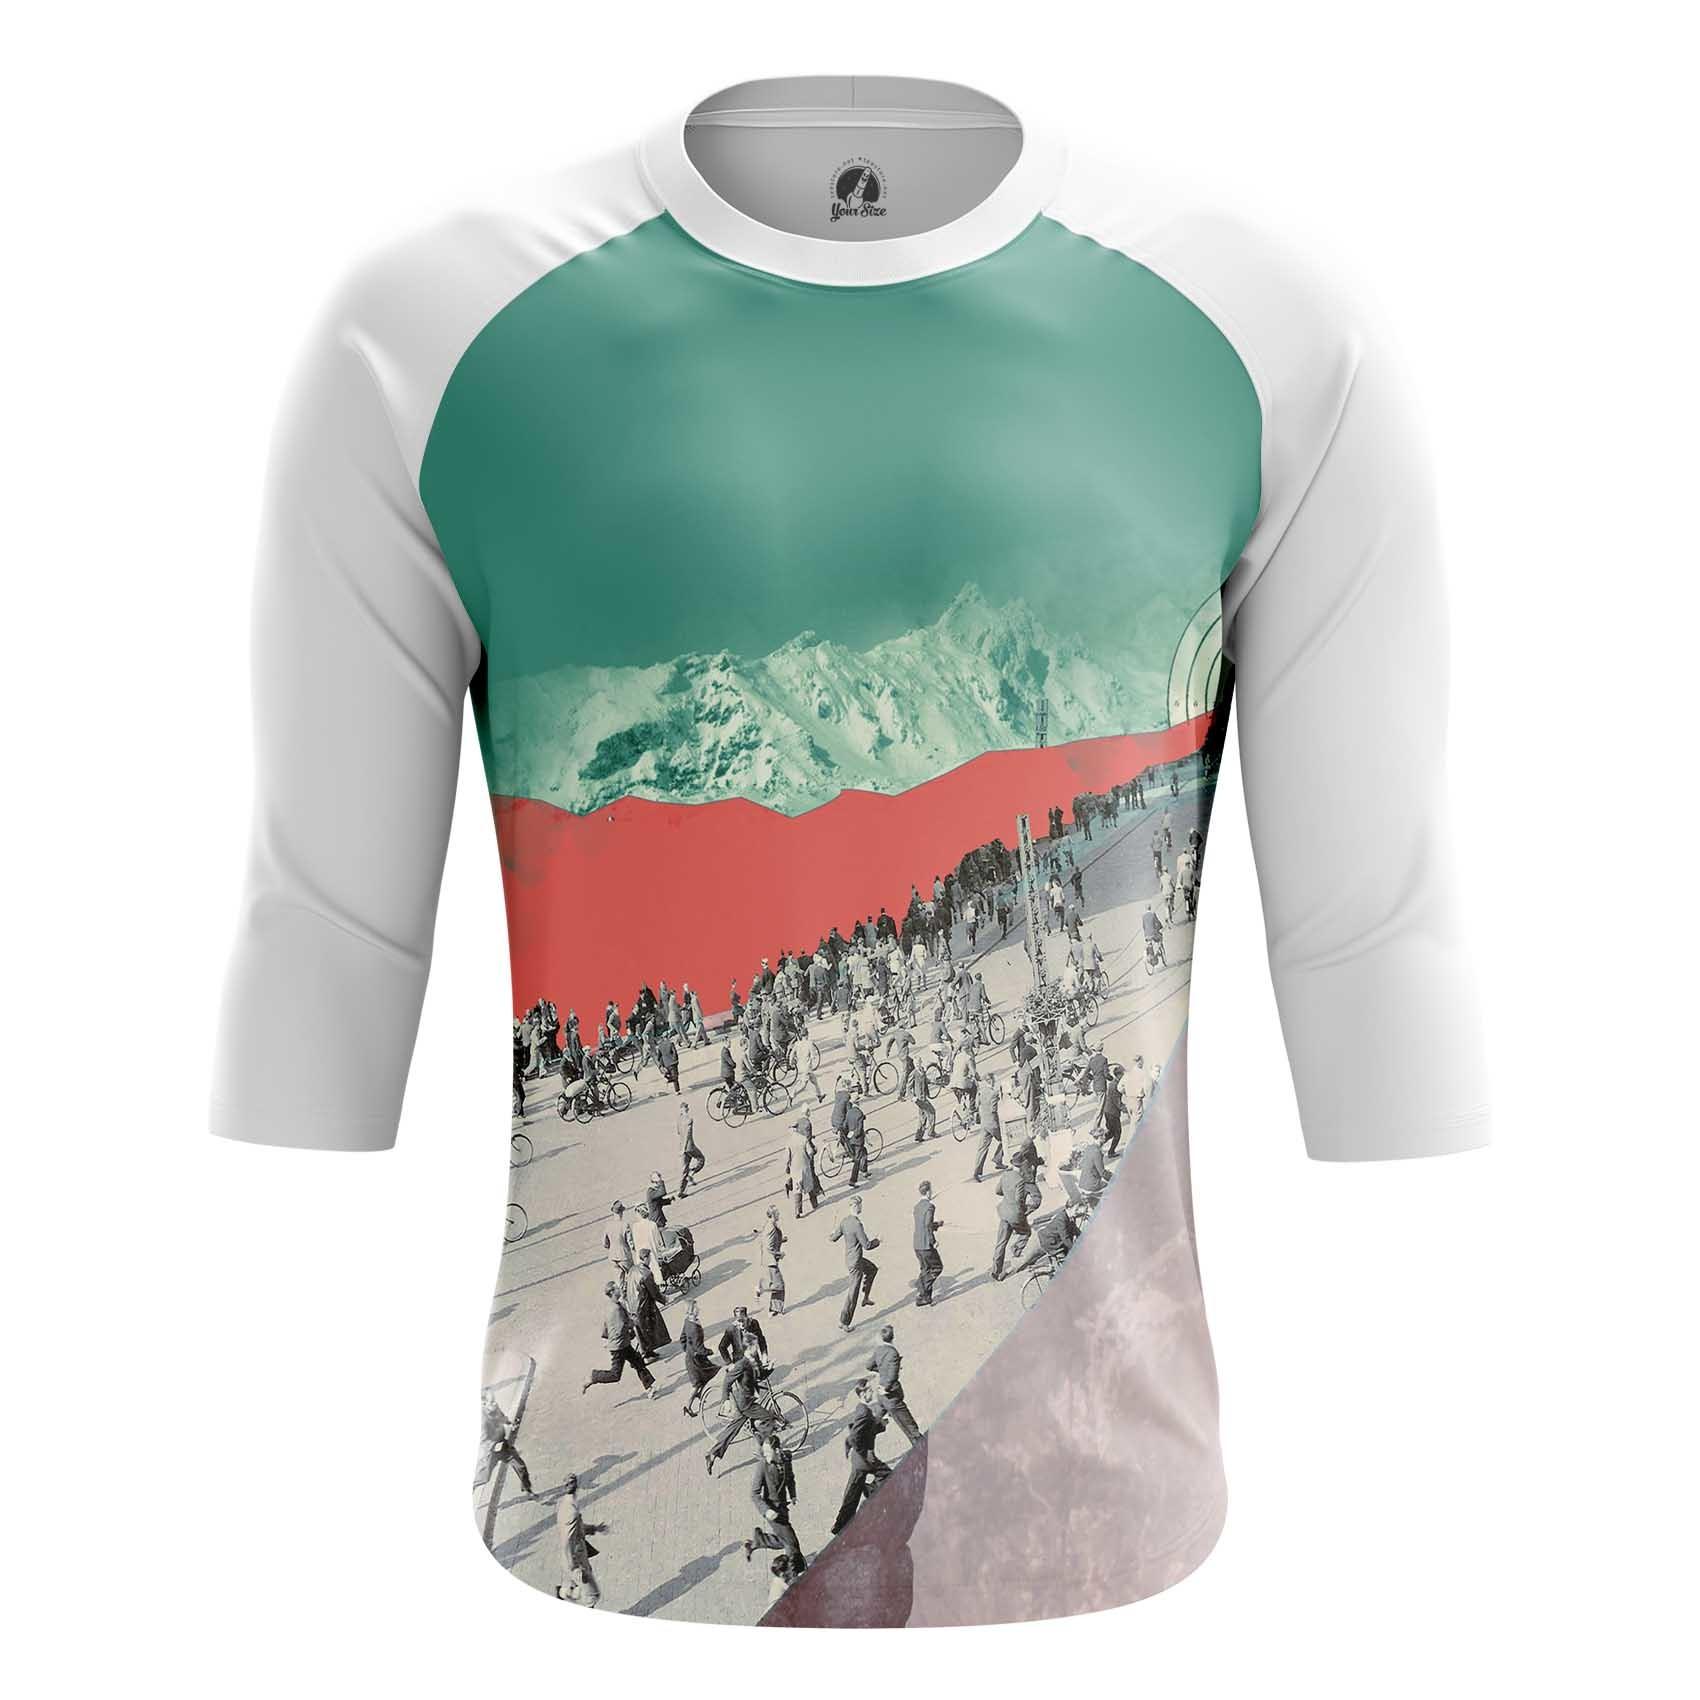 Collectibles Men'S T-Shirt Tunnel Art Picture Art Apprel